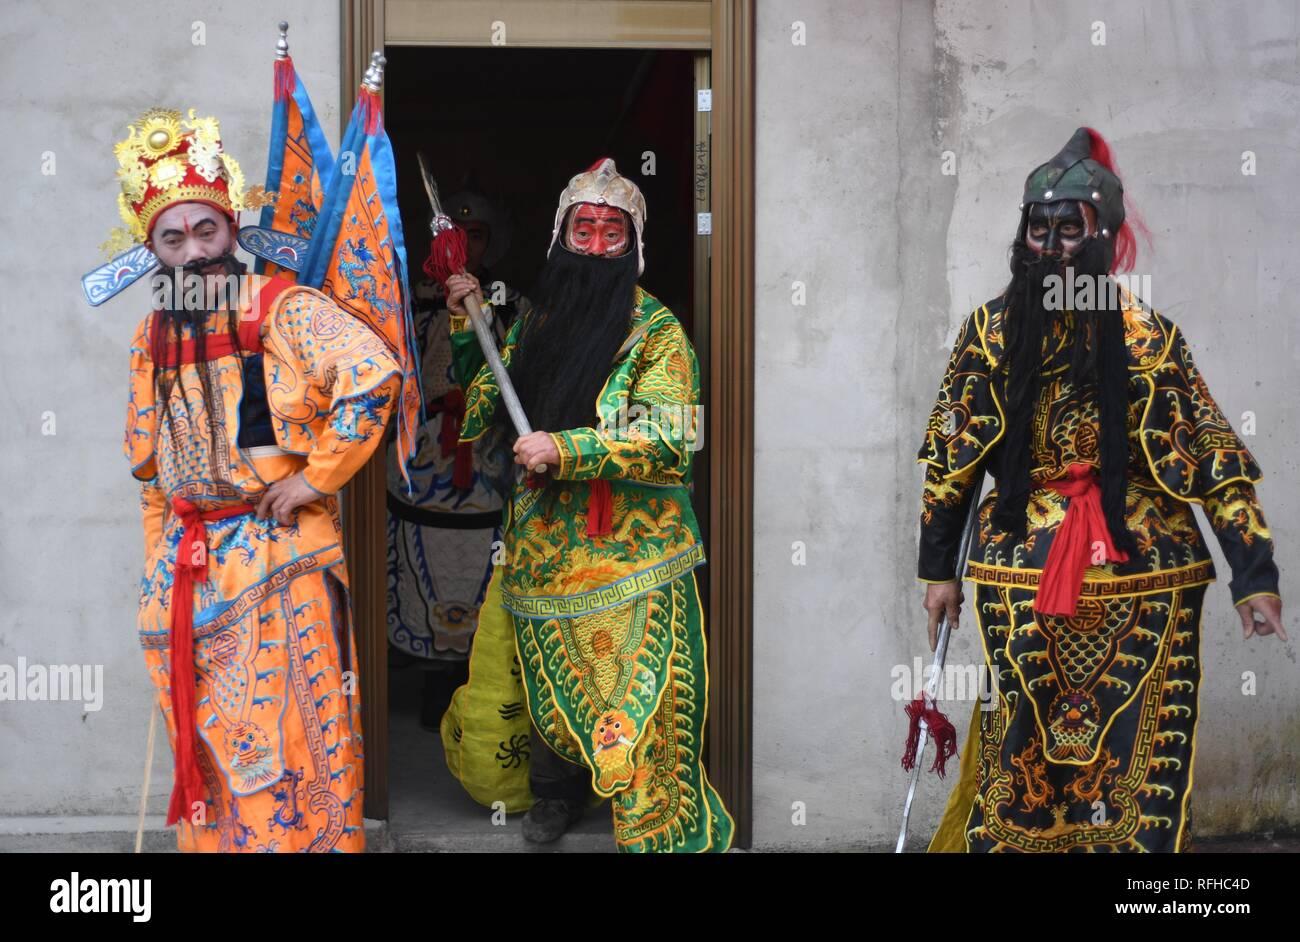 Qiannan, China's Guizhou Province. 25th Jan, 2019. Villagers rehearse for folk play performance celebrating the Spring Festival in Changchong Village of Longchang Township in Bouyei-Miao Autonomous Prefecture of Qiannan, southwest China's Guizhou Province, Jan. 25, 2019. Credit: Cai Xingwen/Xinhua/Alamy Live News Stock Photo